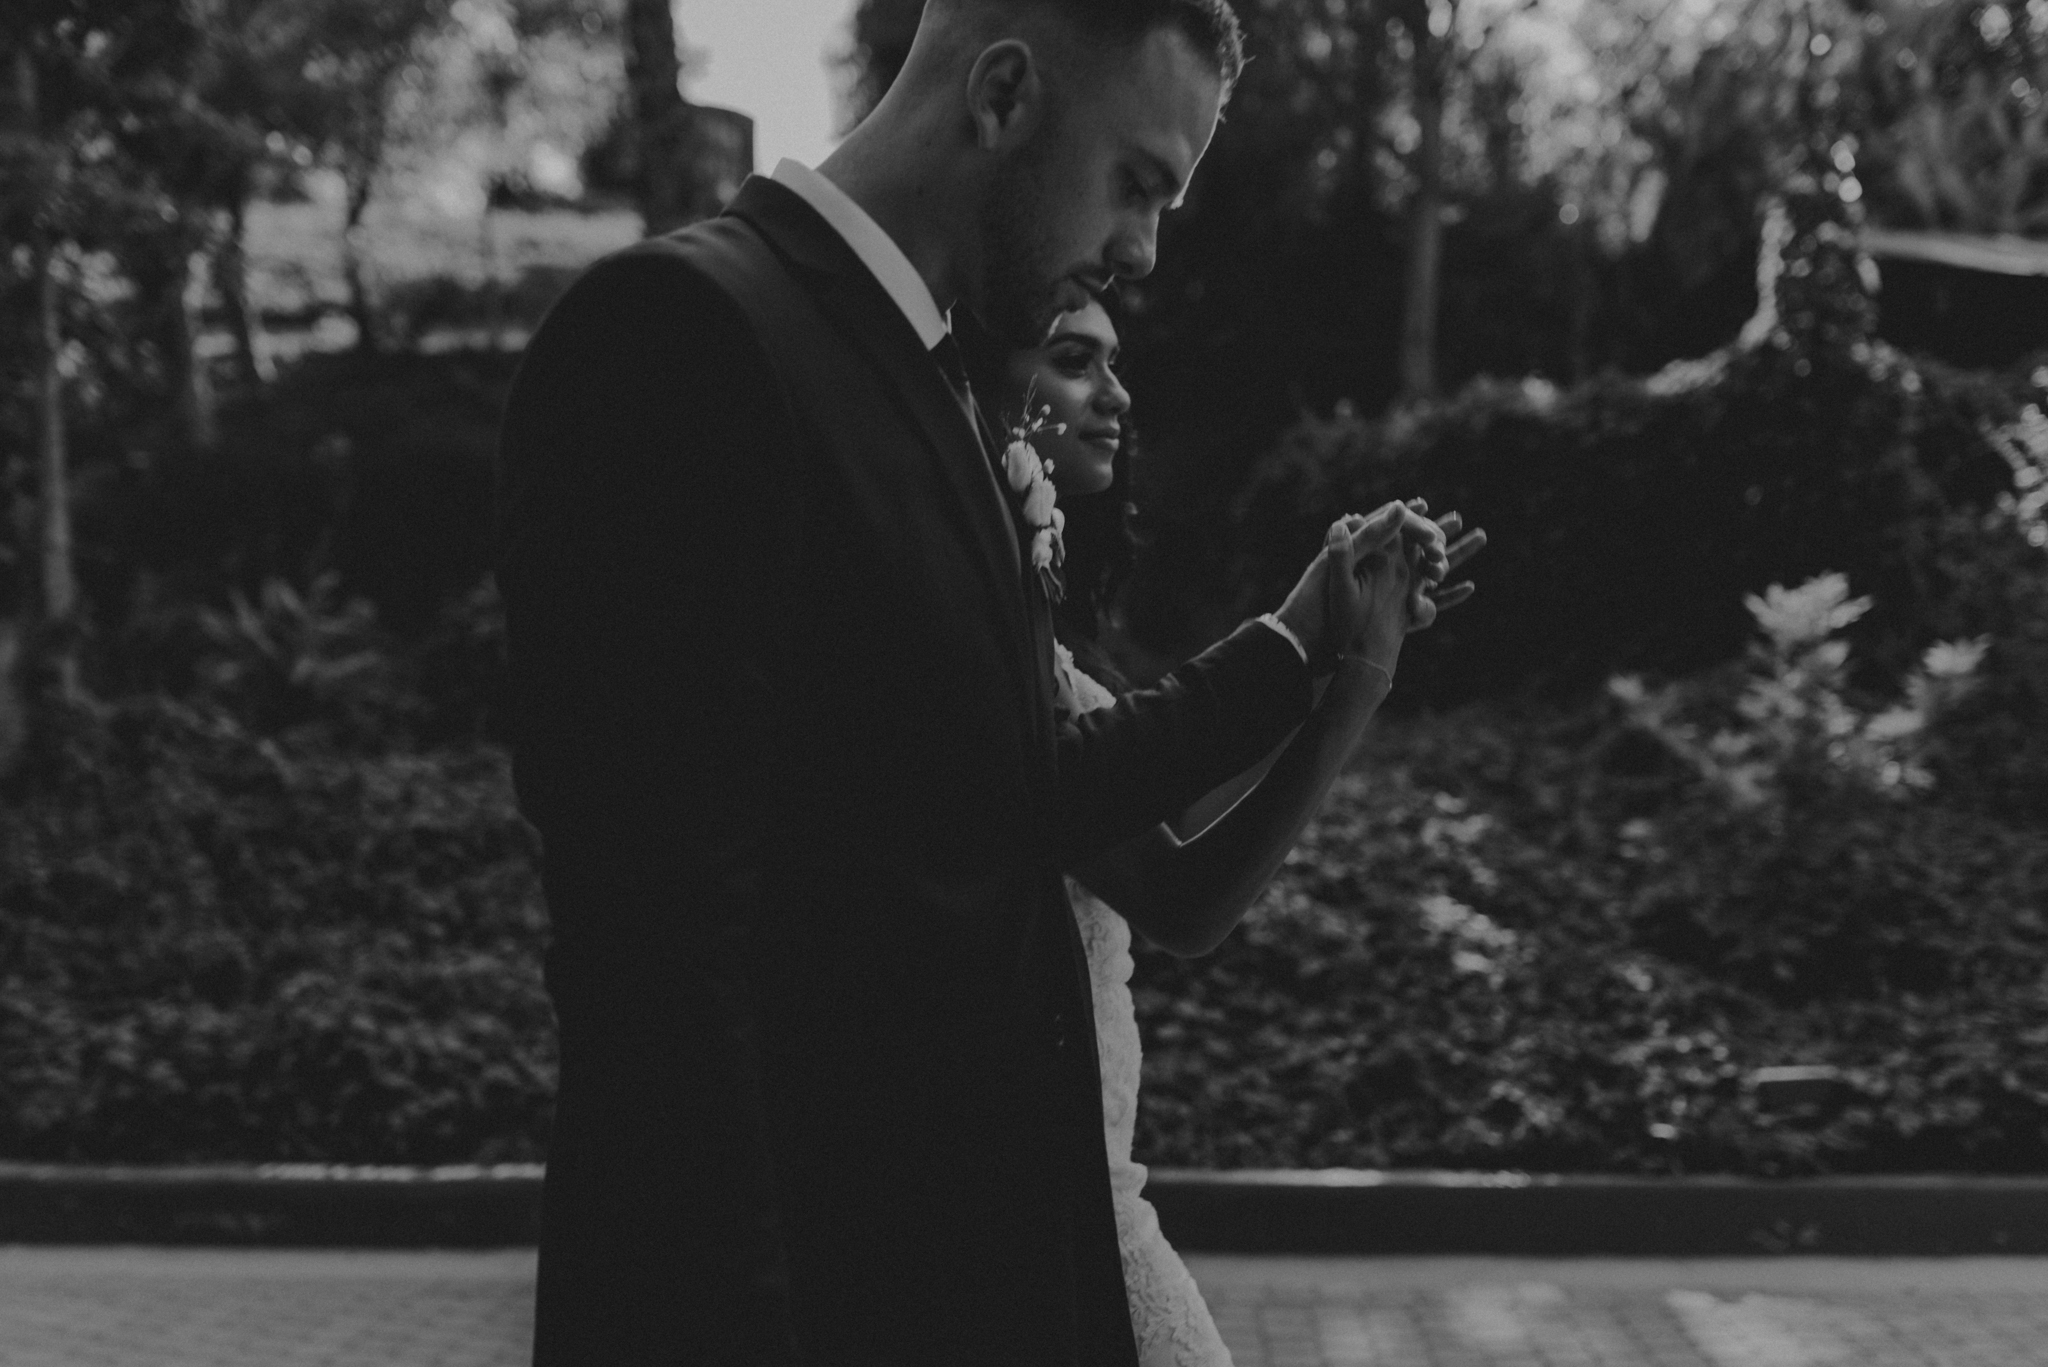 Isaiah + Taylor Photography - Rancho Las Lomas Wedding, Los Angeles Wedding Photographer-105.jpg